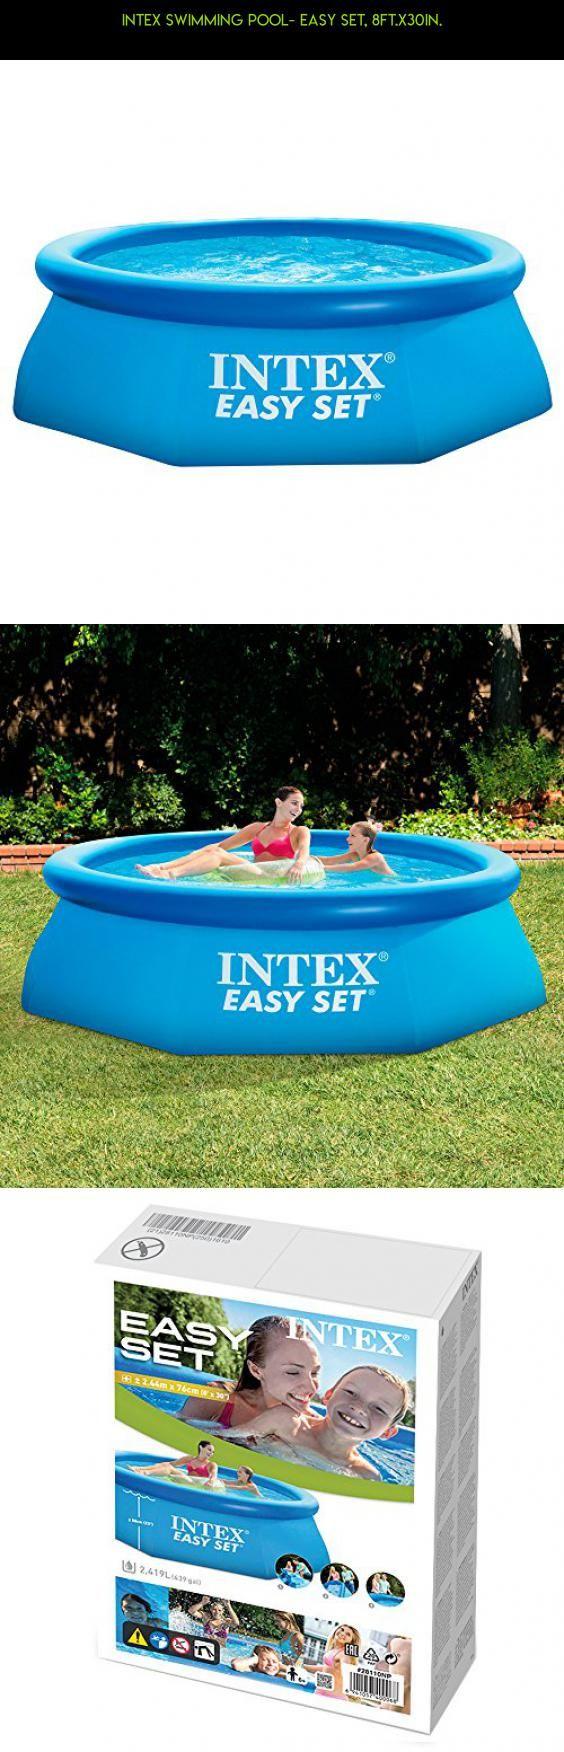 Best 25+ Intex swimming pool ideas on Pinterest | Pool cleaning ...